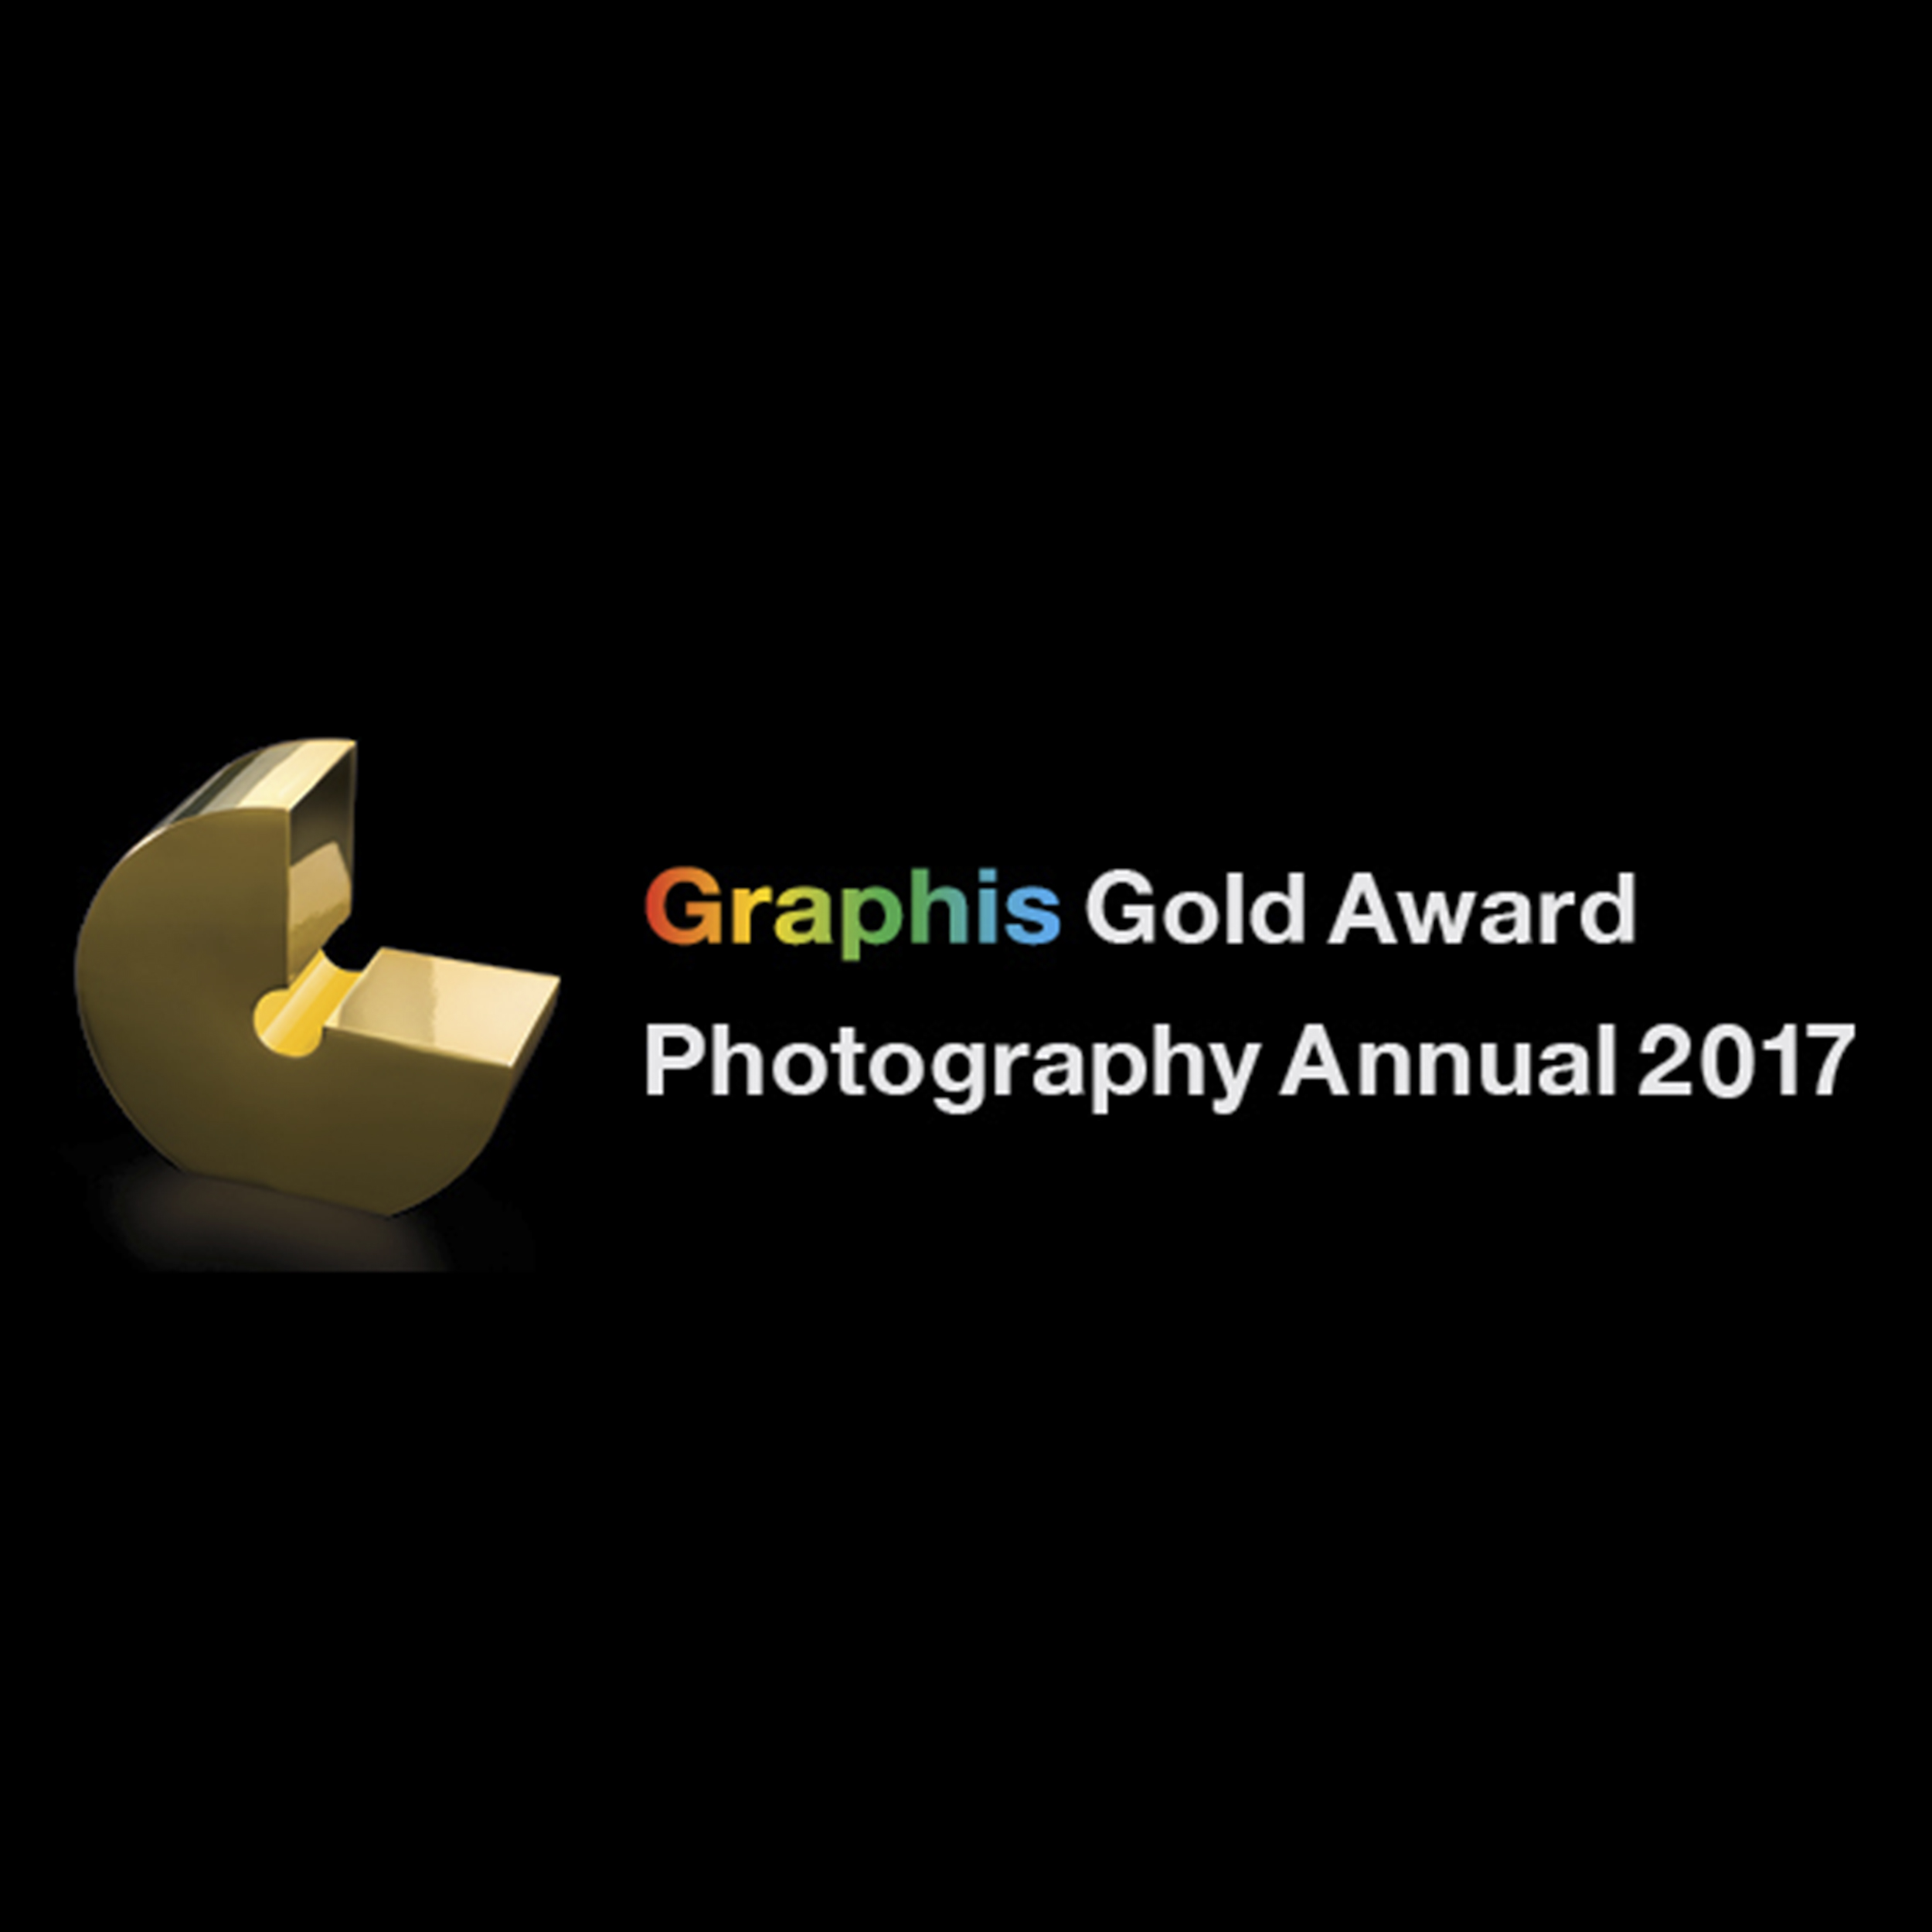 photography20172.jpg